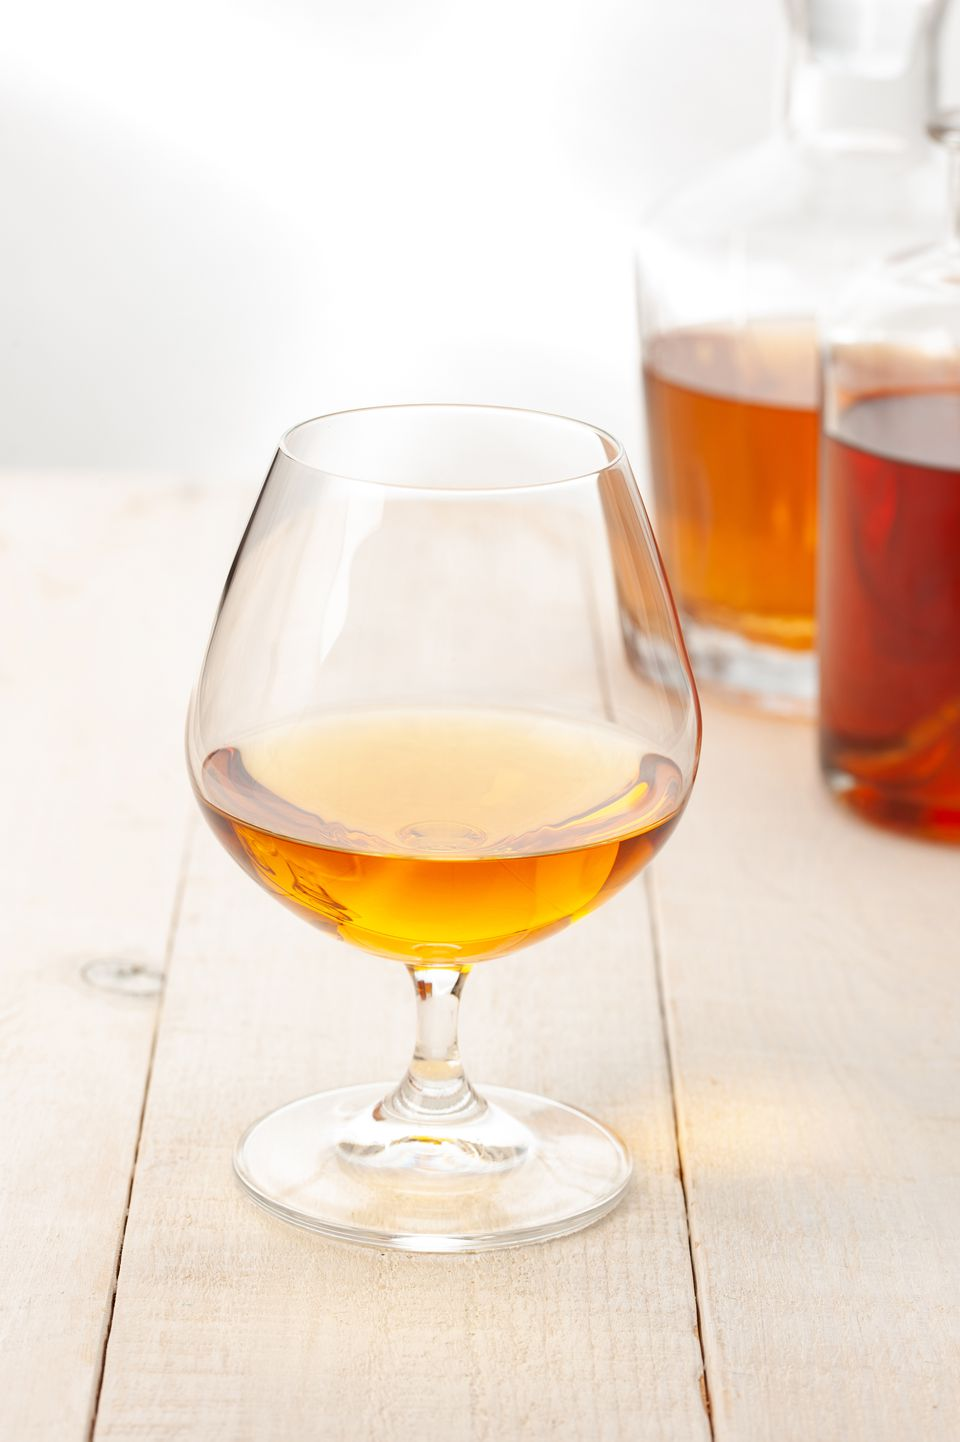 B&B Receta: la bebida perfecta para los amantes del brandy